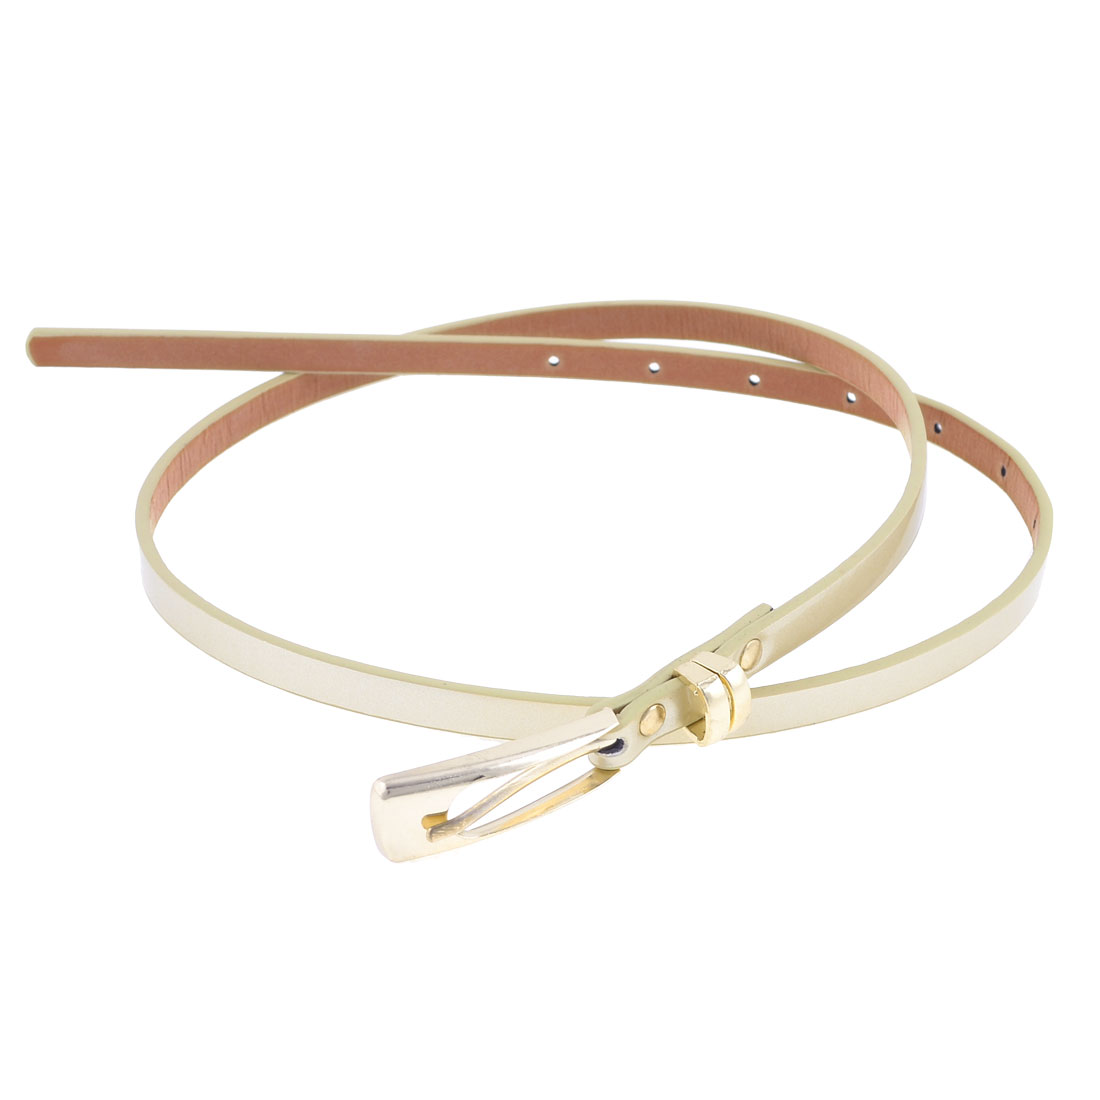 Light Khaki One Pin Buckle Fuax Leather Slender Waist Belt for Women